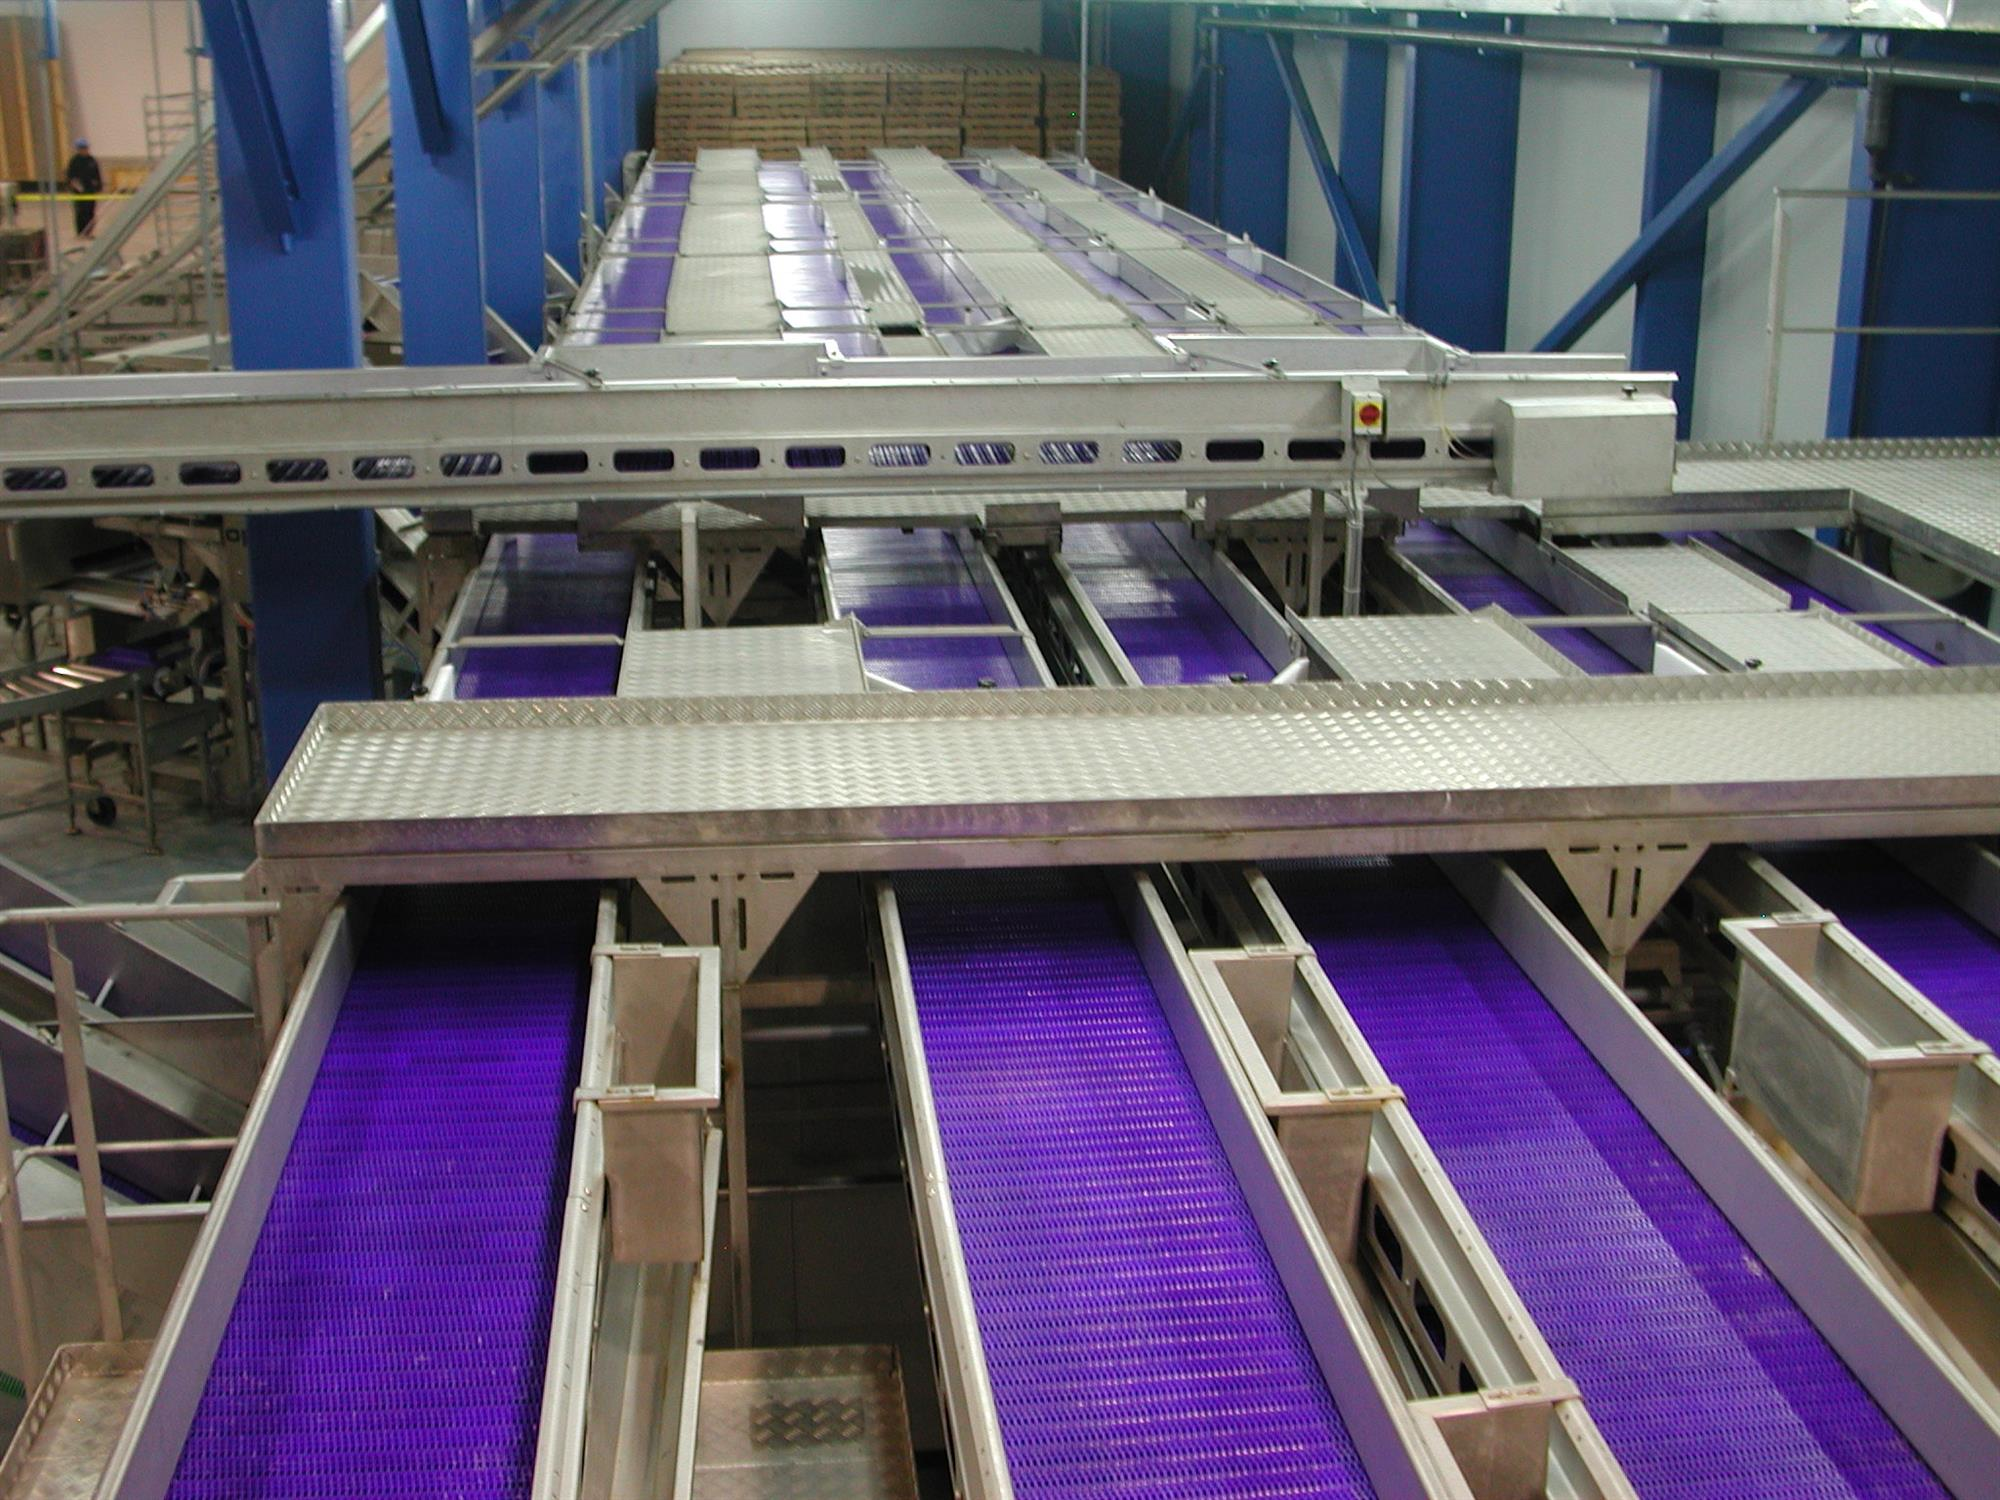 Distribution conveyors